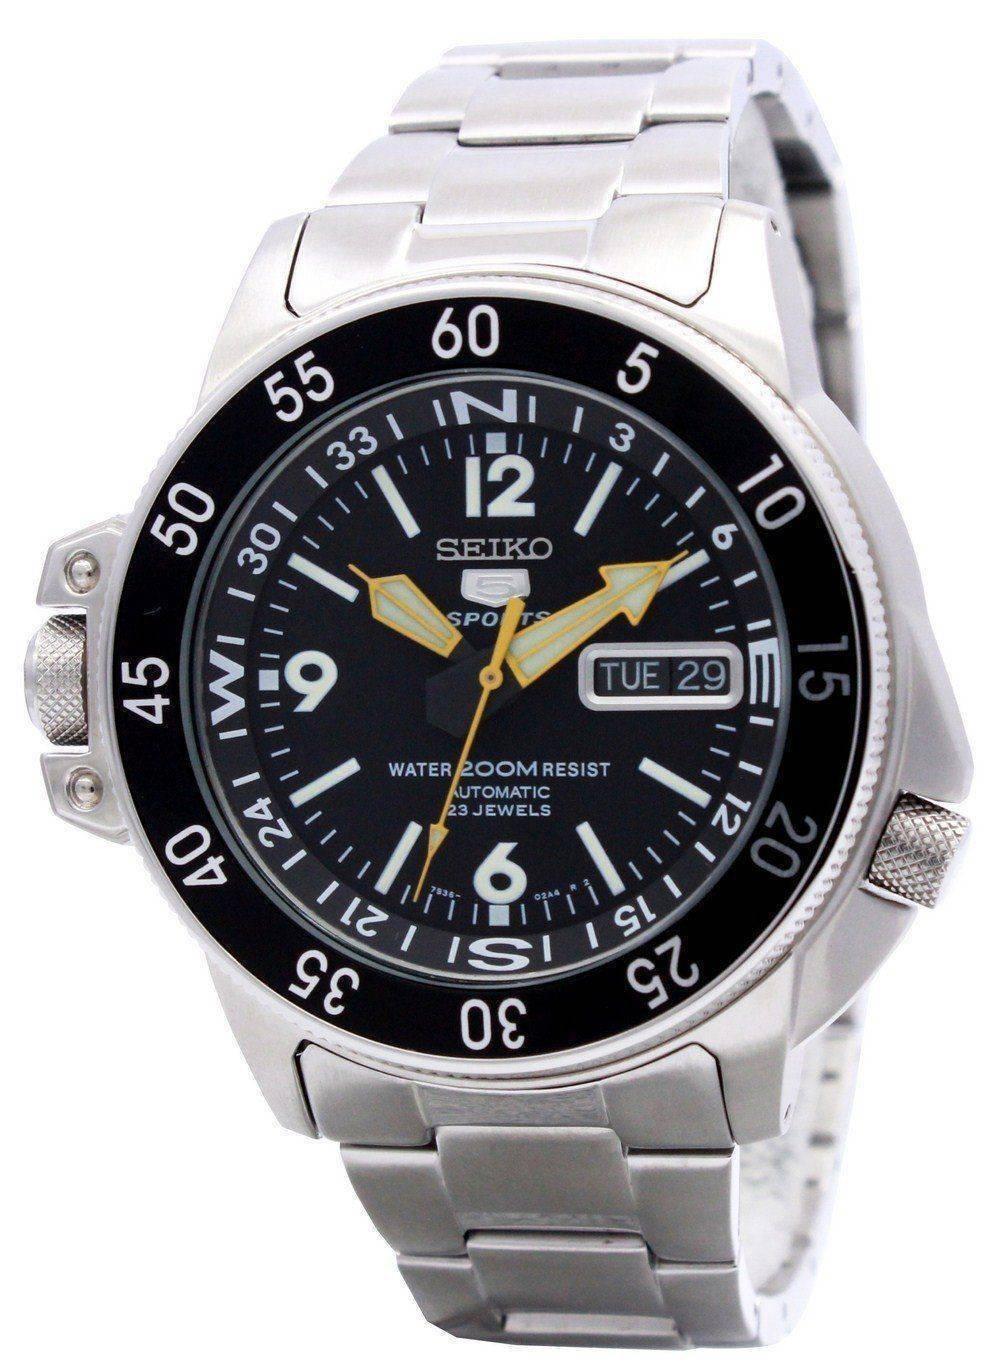 e4e300939d37 Reloj de hombre Seiko 5 con medidor de mapa automático SKZ211 SKZ211K1  SKZ211K